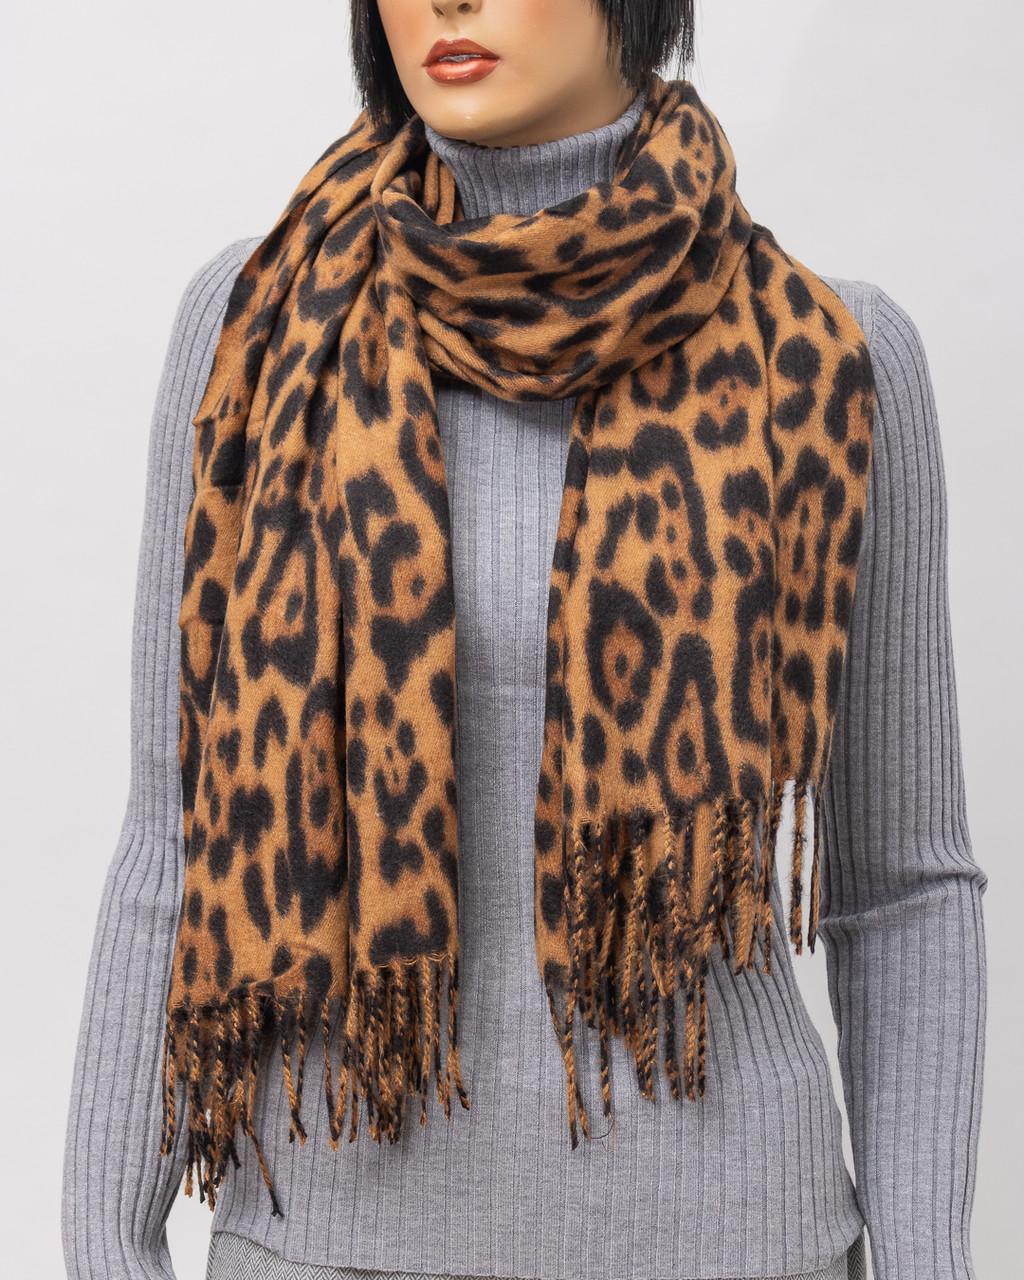 Шарф - платок женский SHARF S191-335 CAMEL TIGR